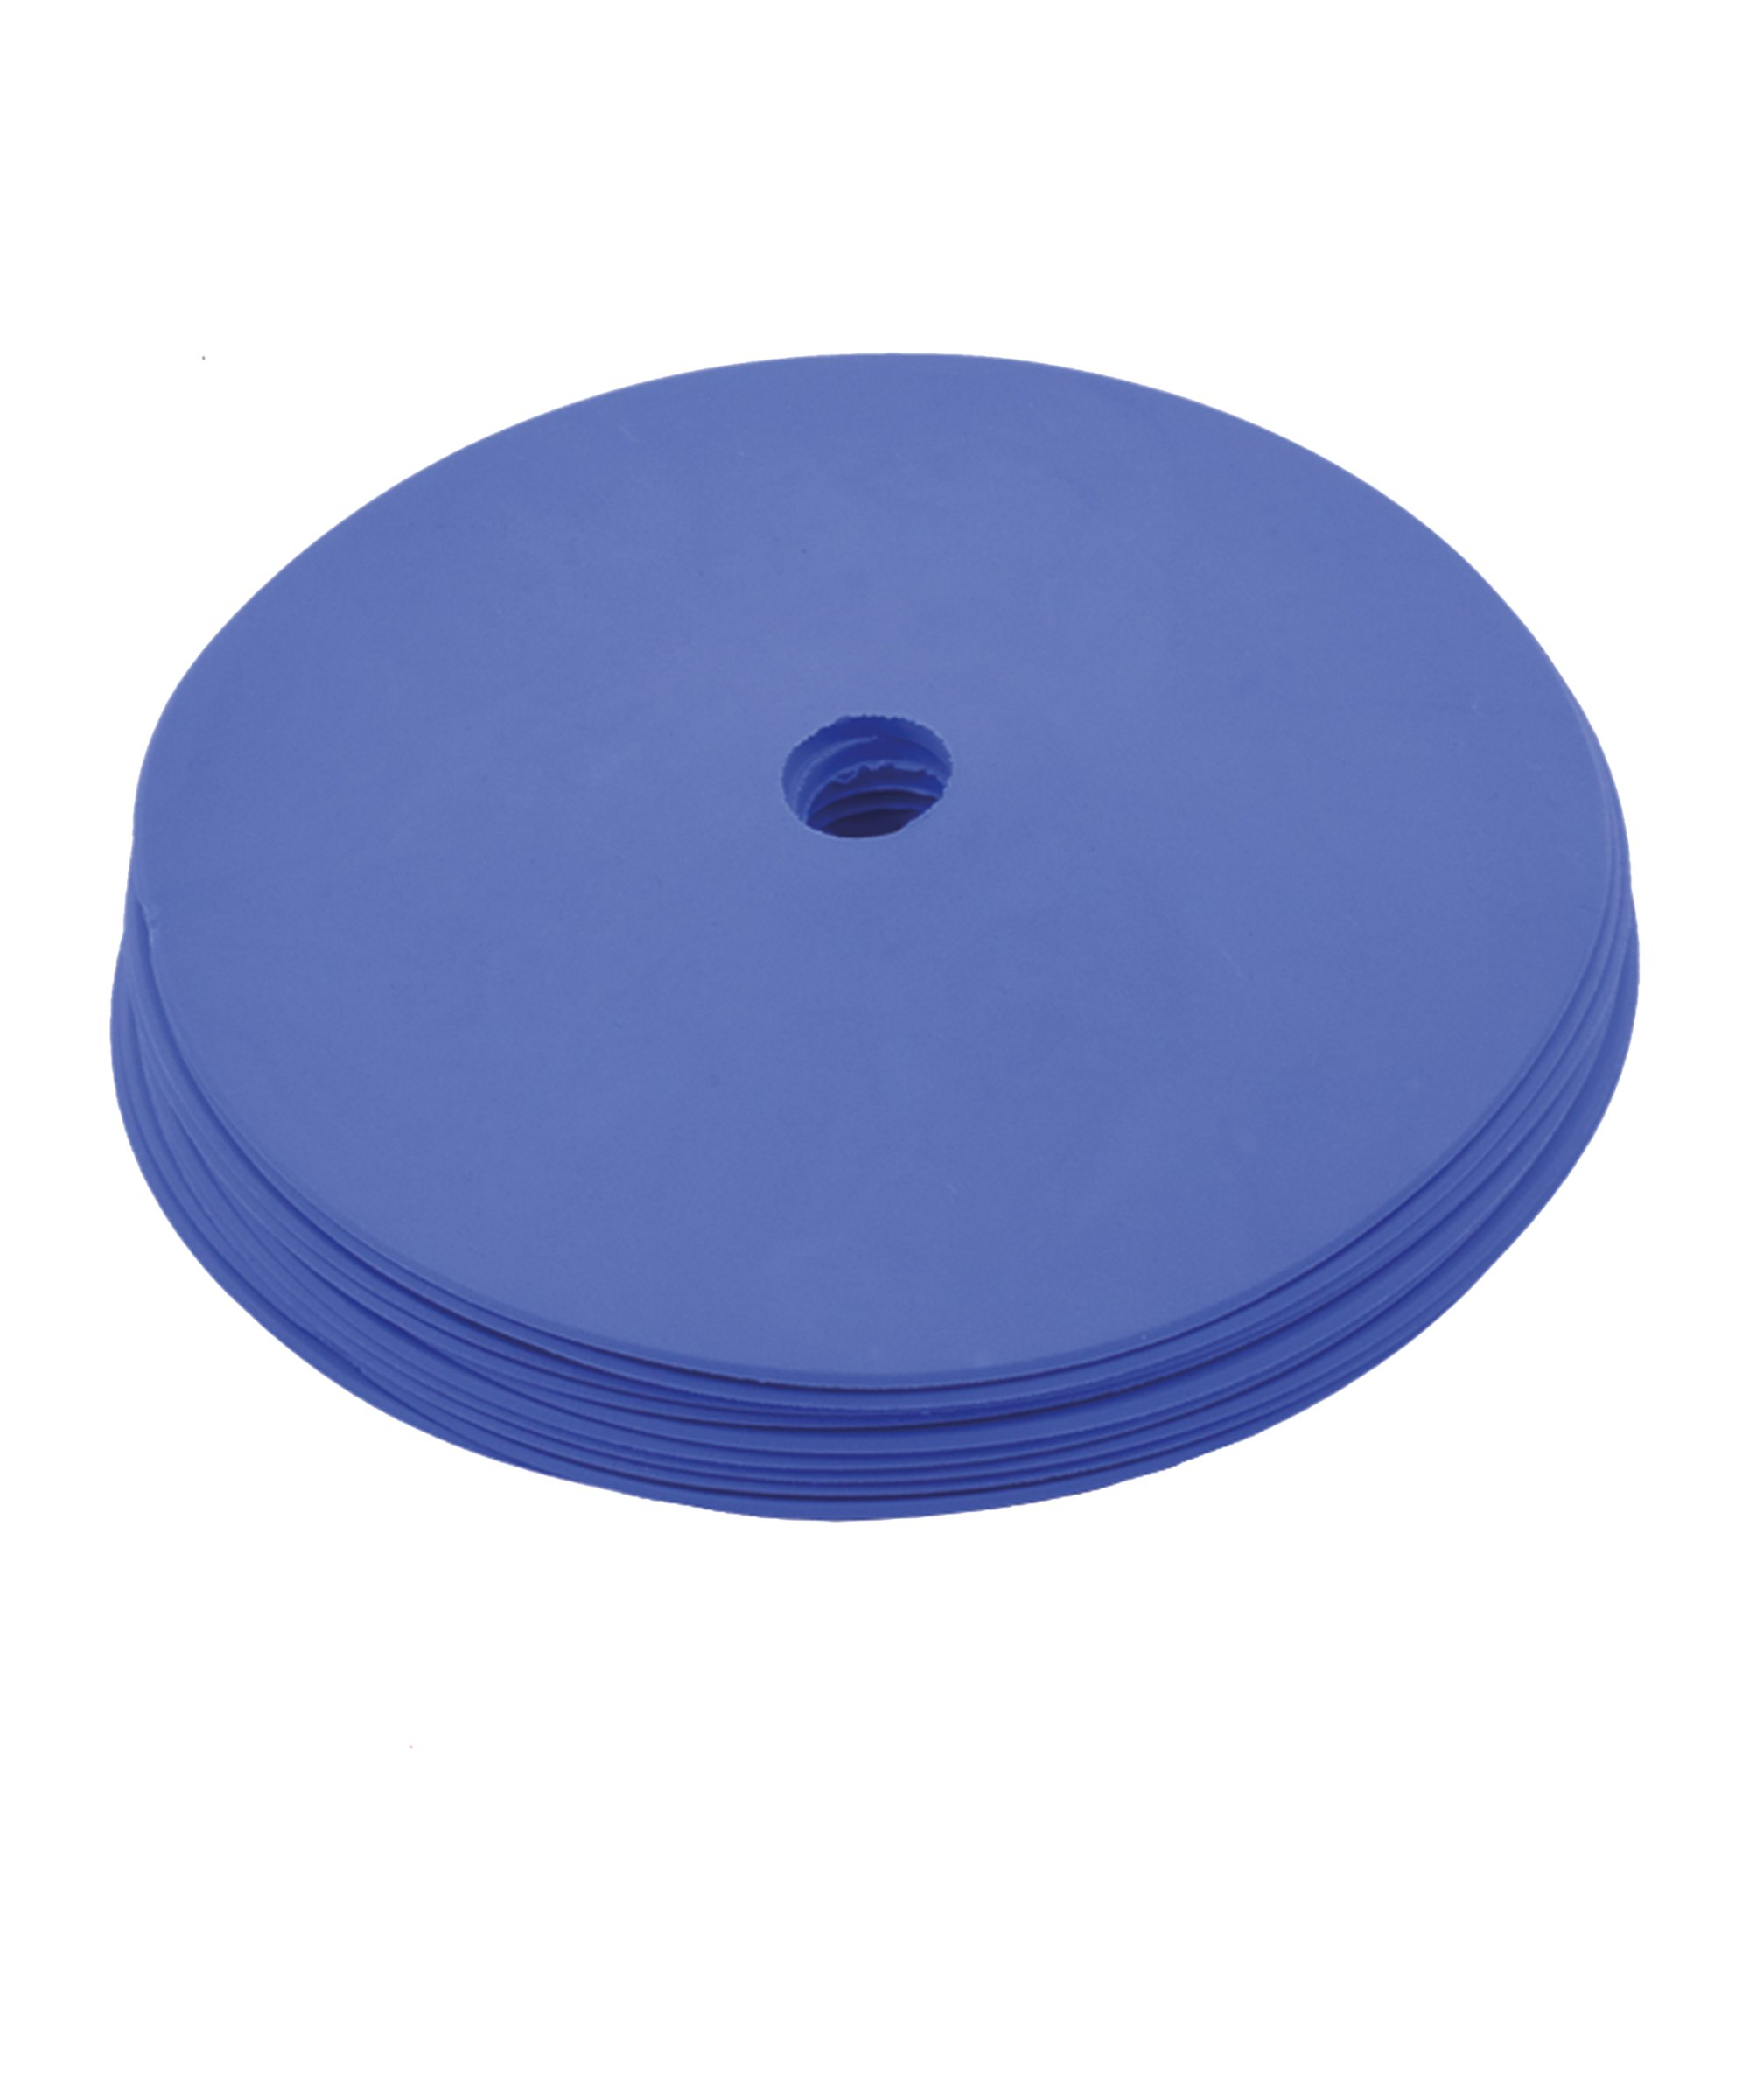 Cawila PRO TRAINING Floormark 10er Set d15mm Blau - blau